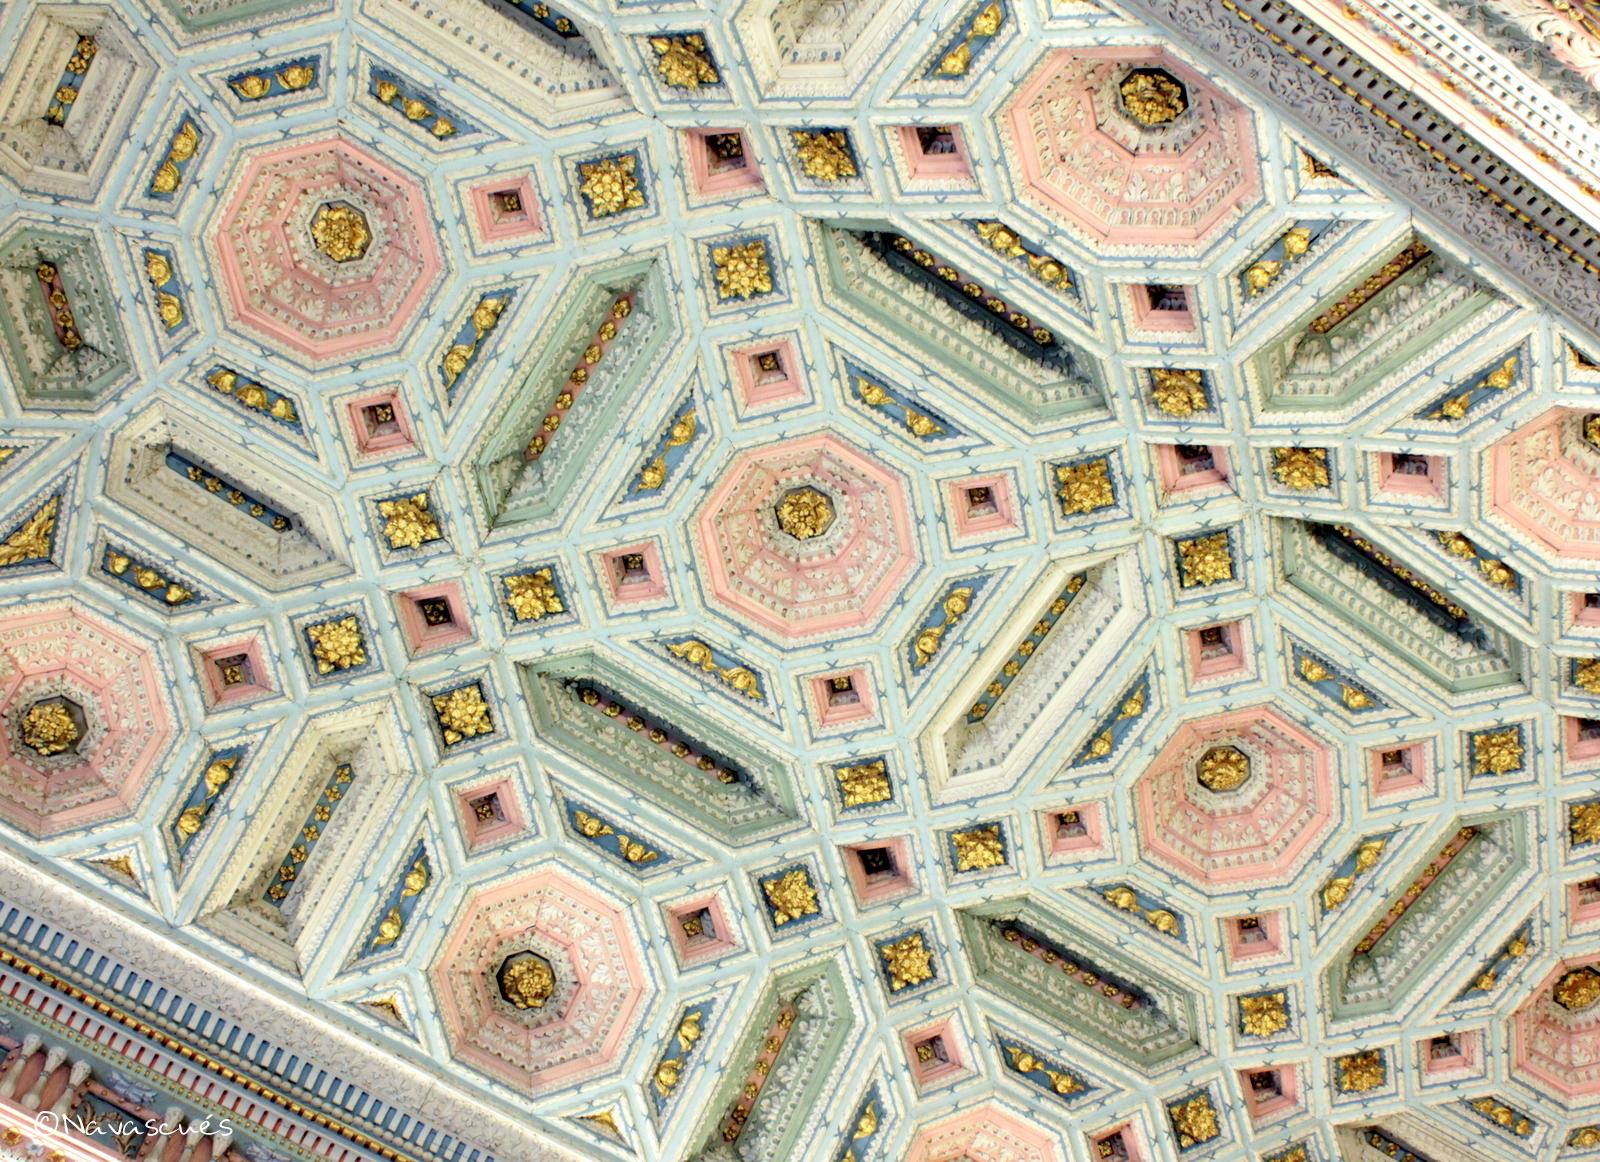 Detalle del techo de la Sala Capitular